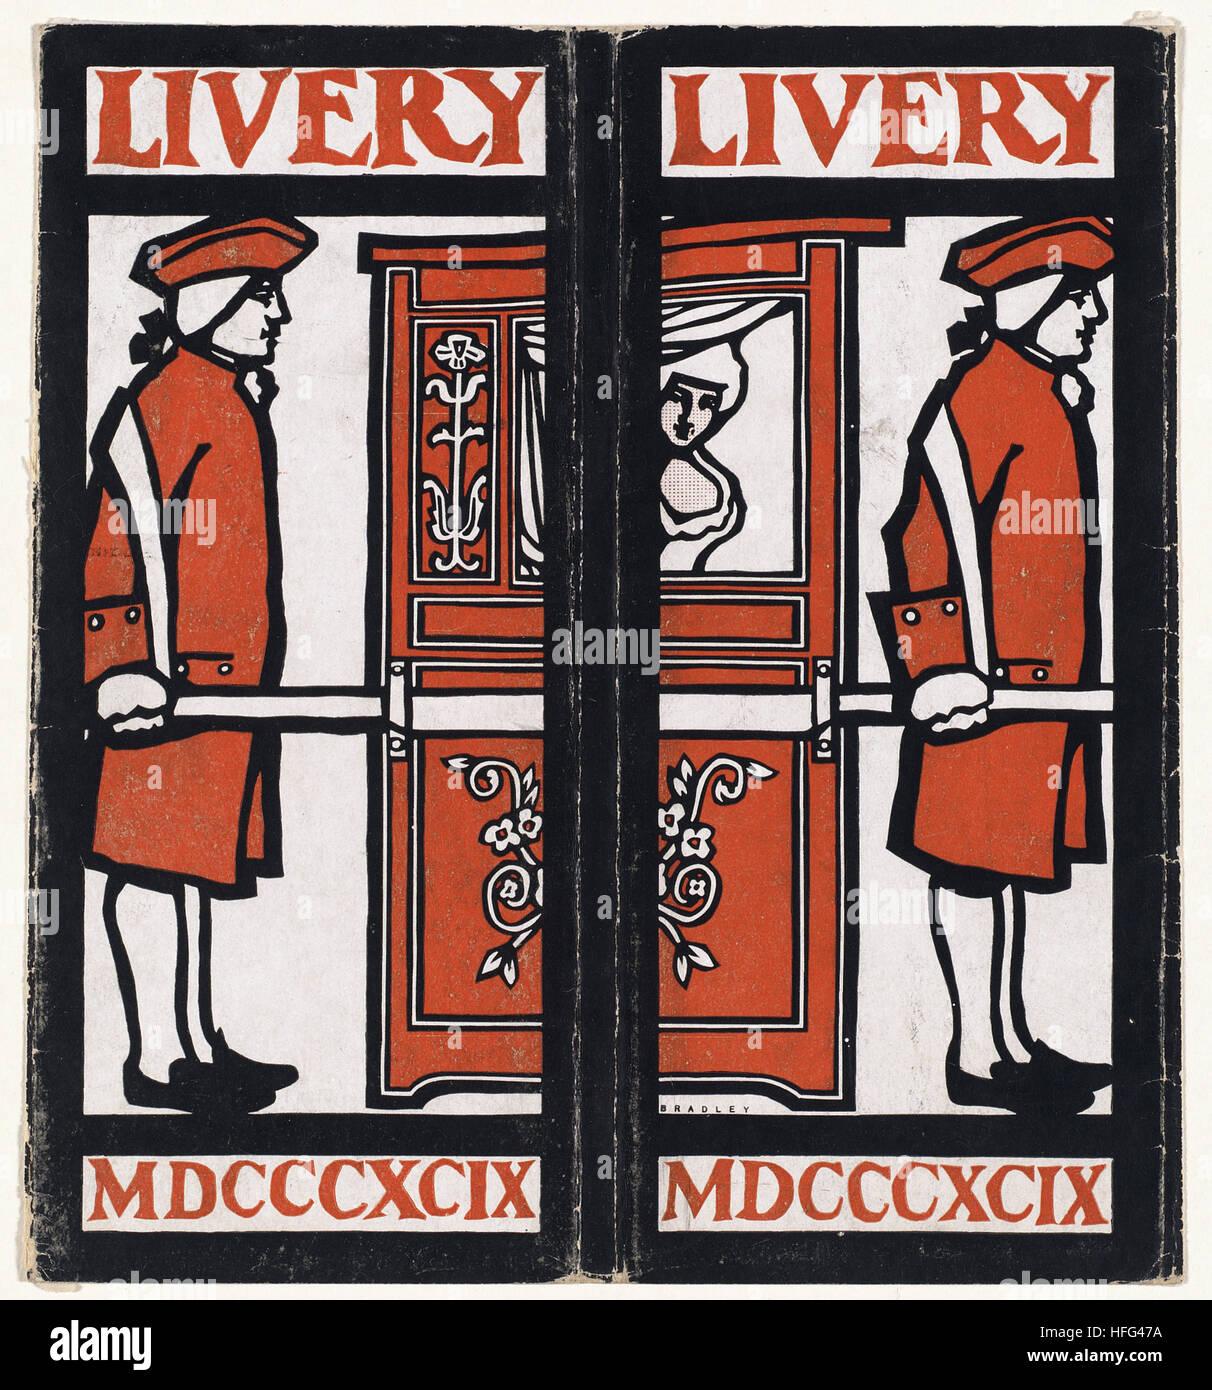 Livery, MDCCCXCIX - Stock Image